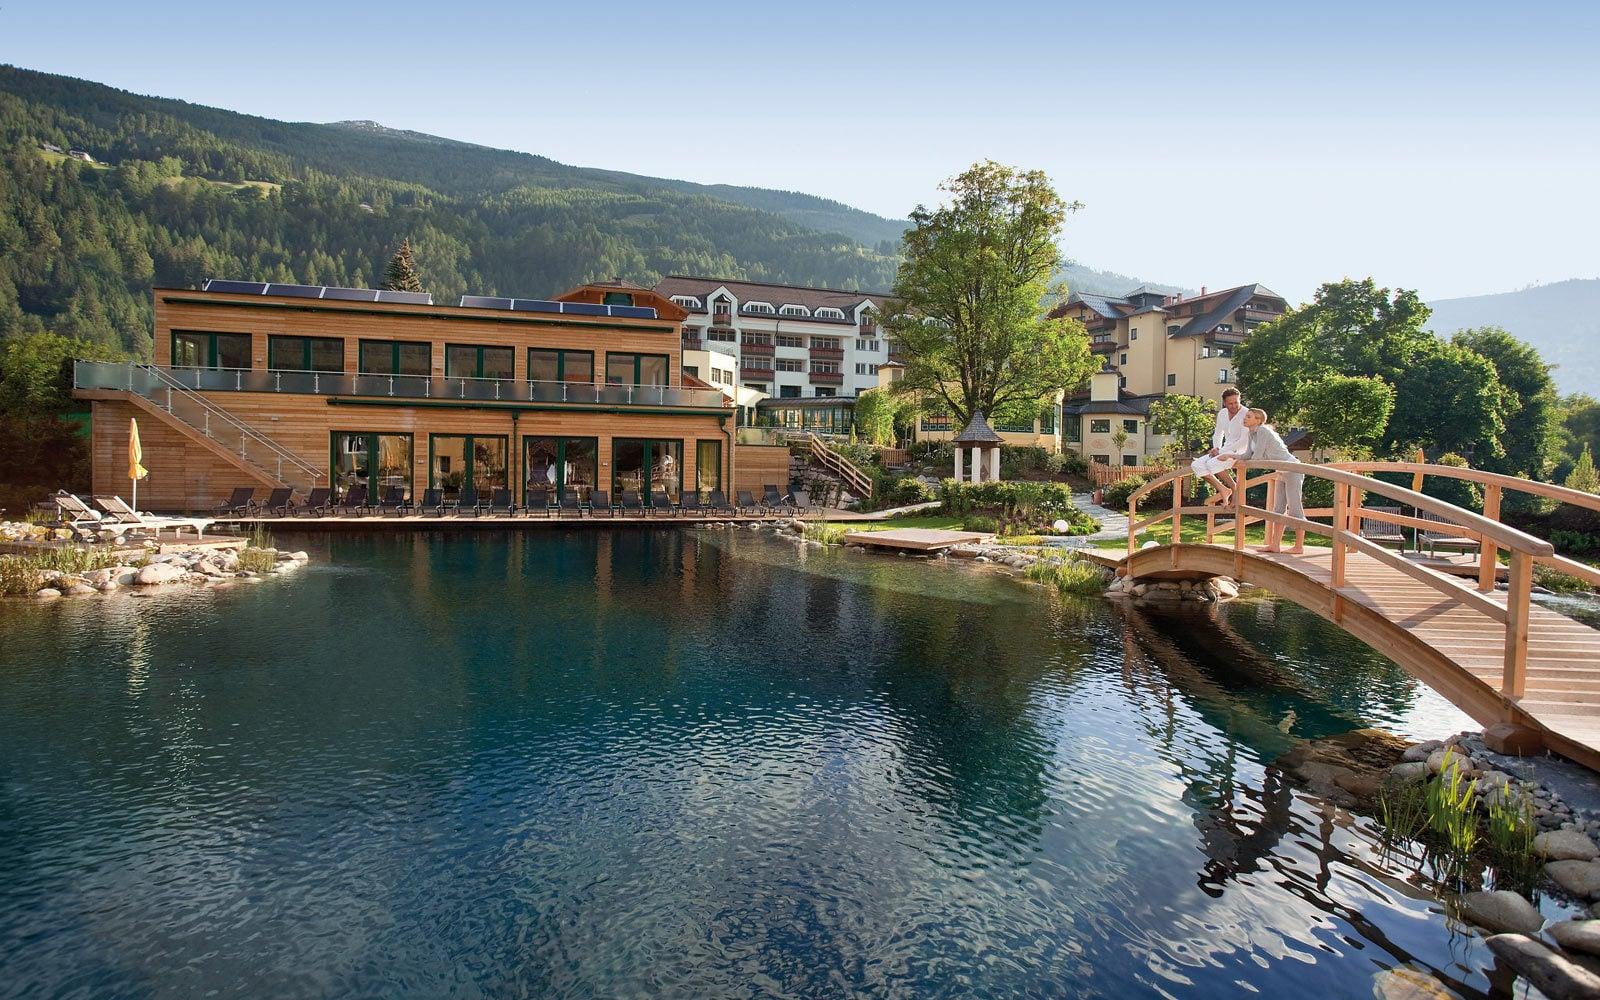 600-m² solar-heated swimming pond